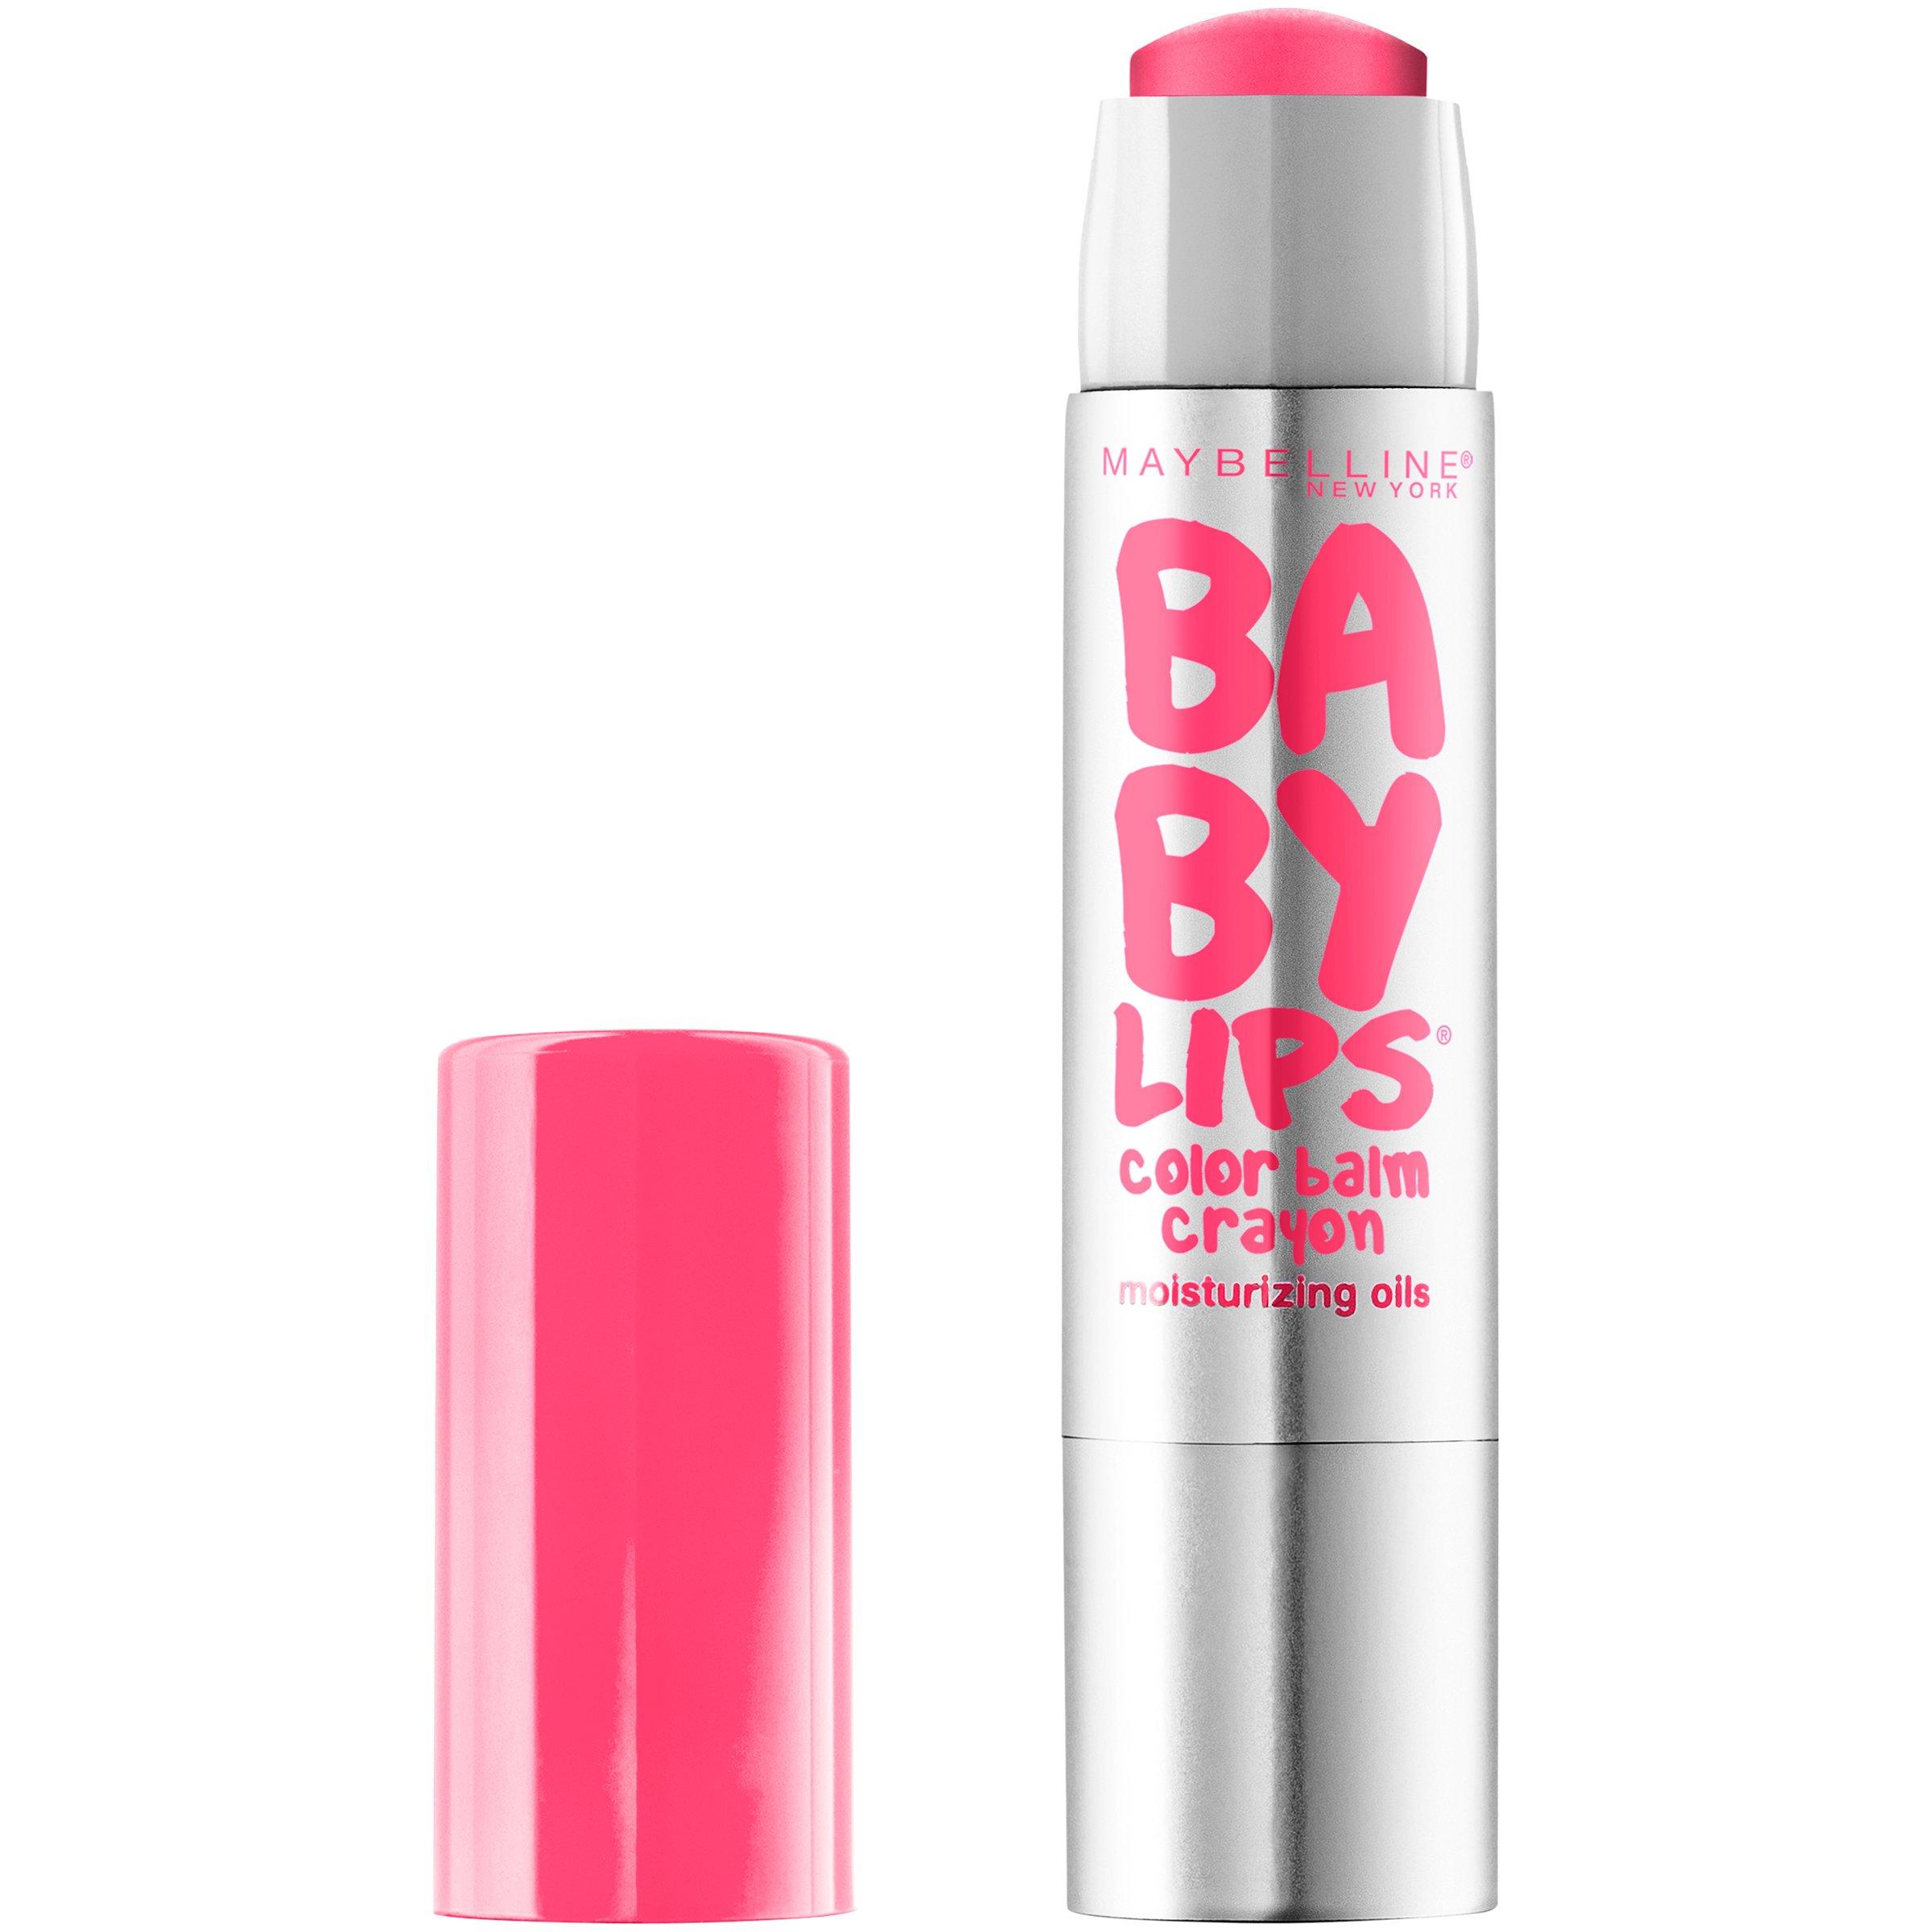 Maybelline Baby Lips Color Balm Crayon, Strawberry Pop, 0.09 oz.